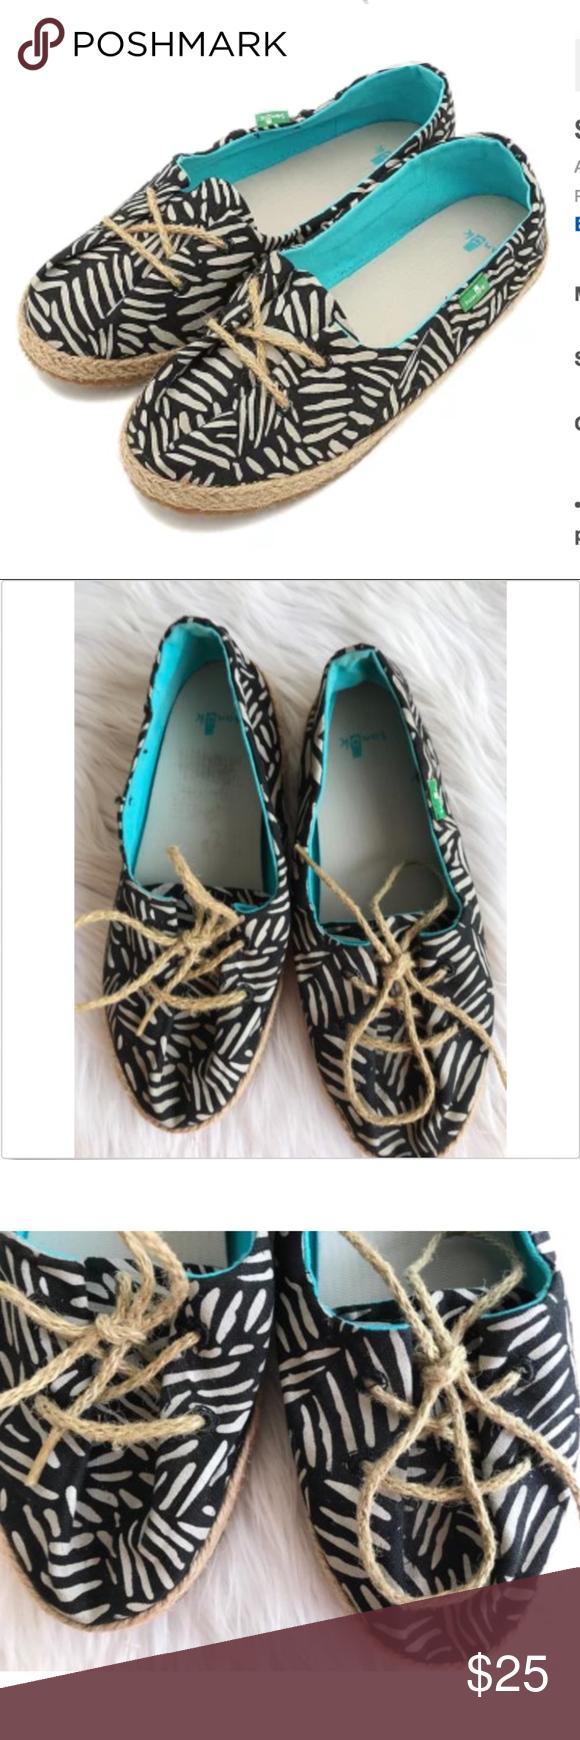 f7c29845937 Sanuk Womens Shoes Mochi Jute Lace-up Sanuk Womens Shoes Mochi Lace-up Jute  Tie Colors  Natural Black Size 6 Great clean condition - no box Measures  9  1 2